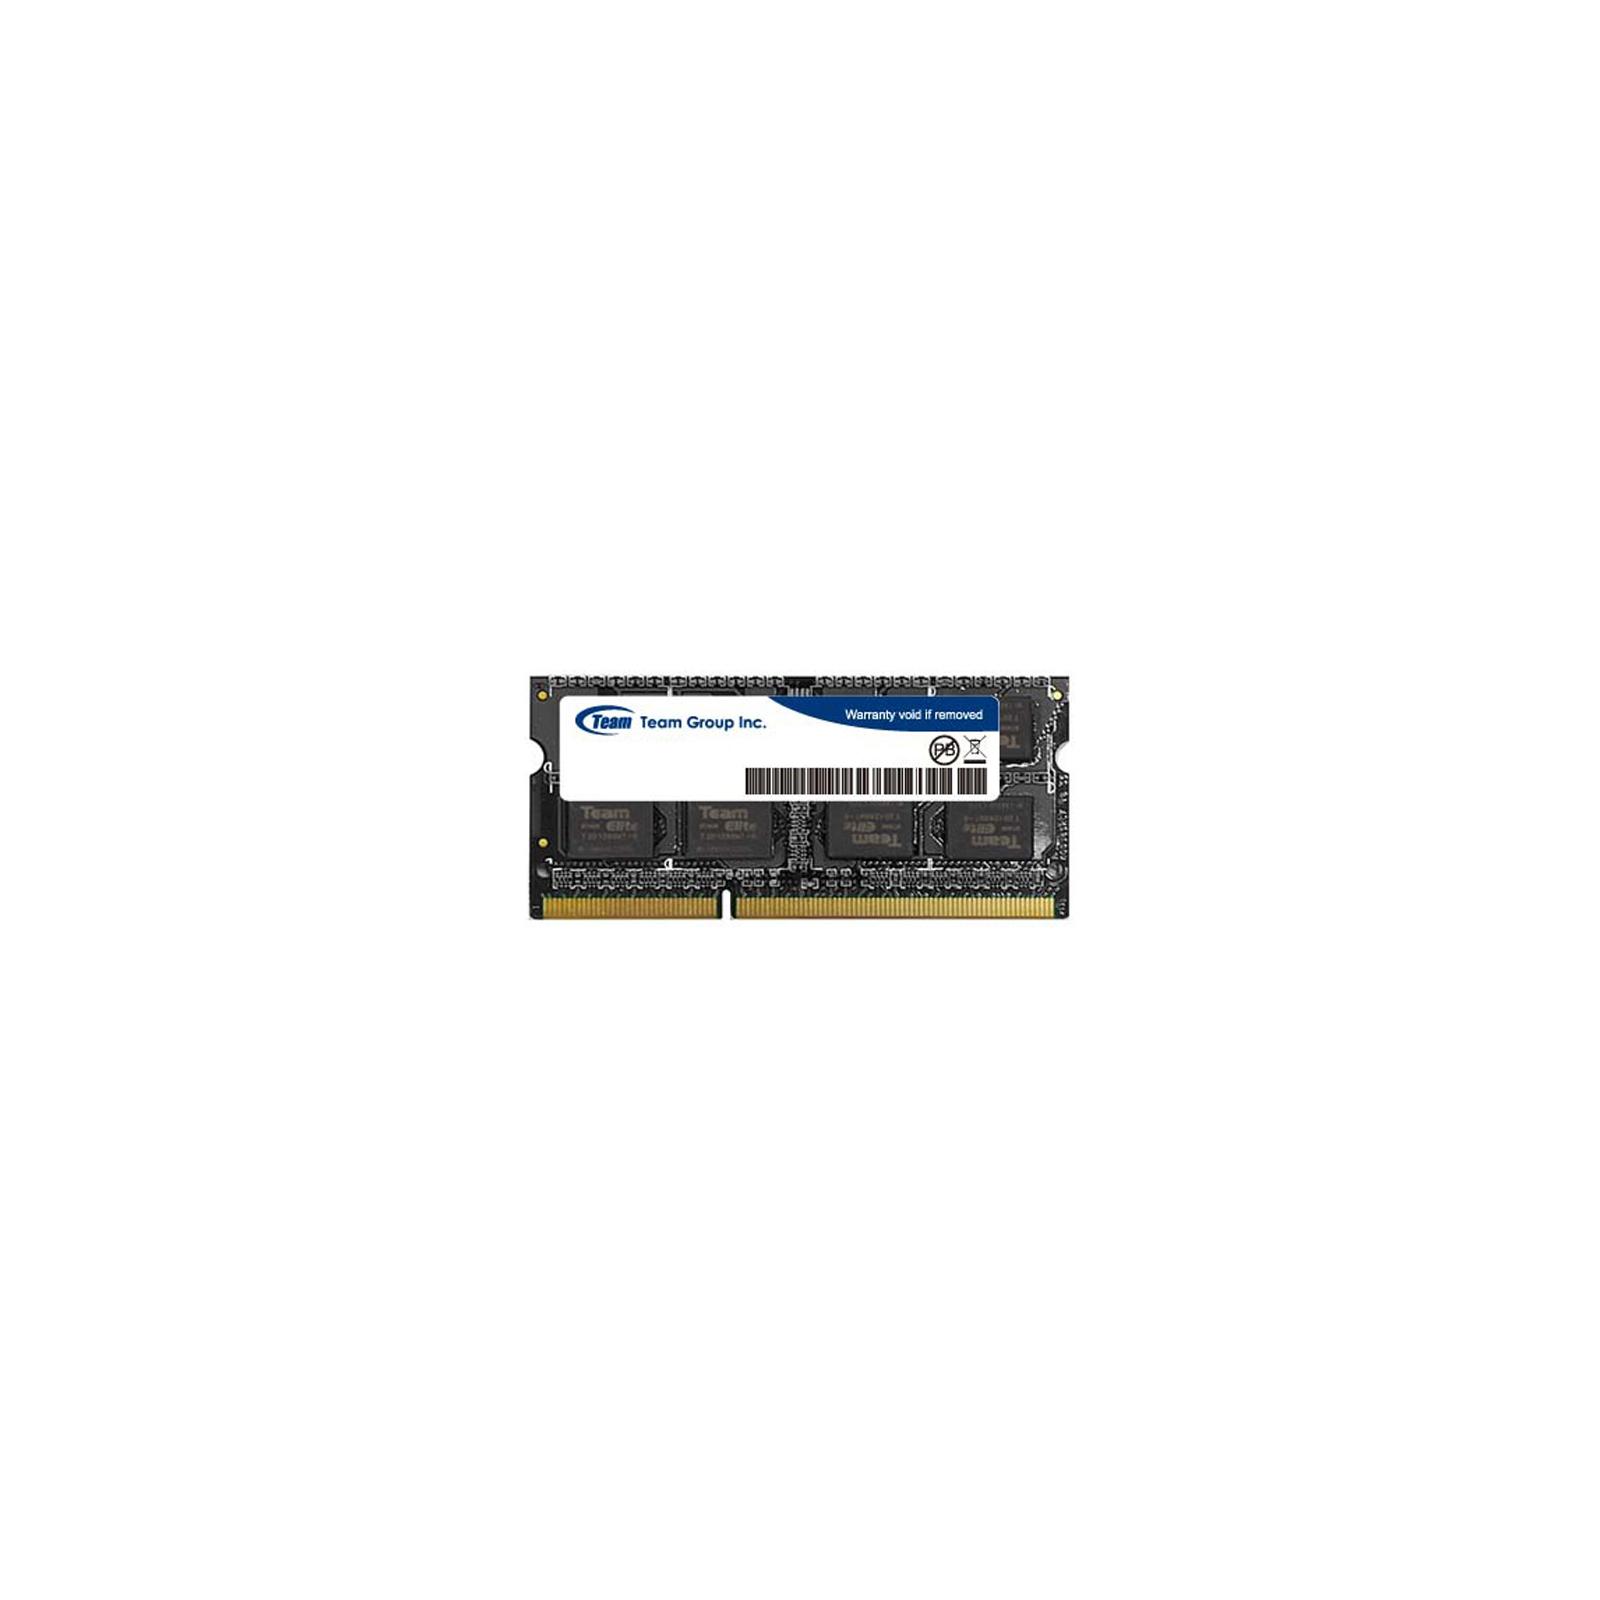 Модуль памяти для ноутбука SoDIMM DDR3 4GB 1600 MHz Team (TED3L4G1600C11-SBK)